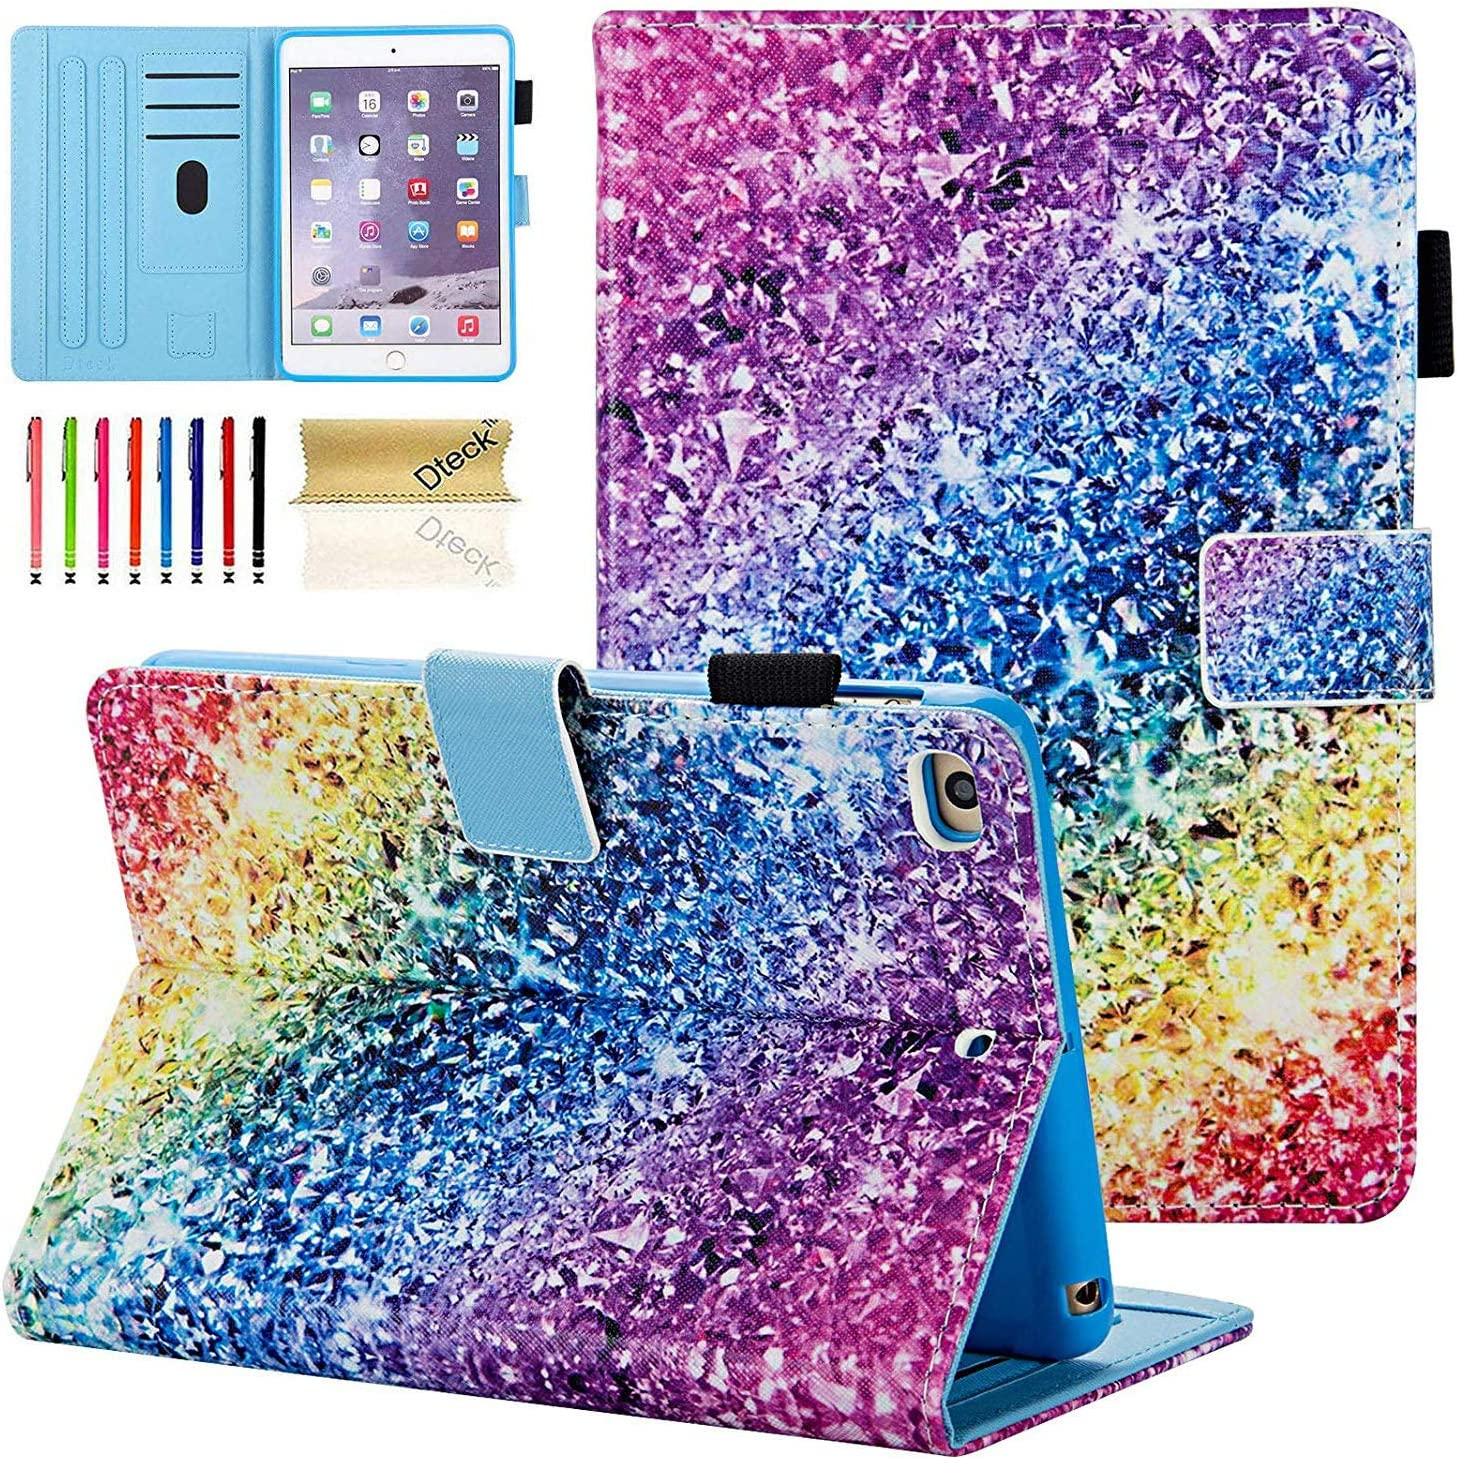 iPad Mini Case, Mini 2 3 4 5 Case, Dteck Slim Multi-Angle View Stand PU Leather Magnetic Case with Auto Wake/Sleep Smart Cover for Apple iPad Mini 1/2/3/4/5, Colorful Sand